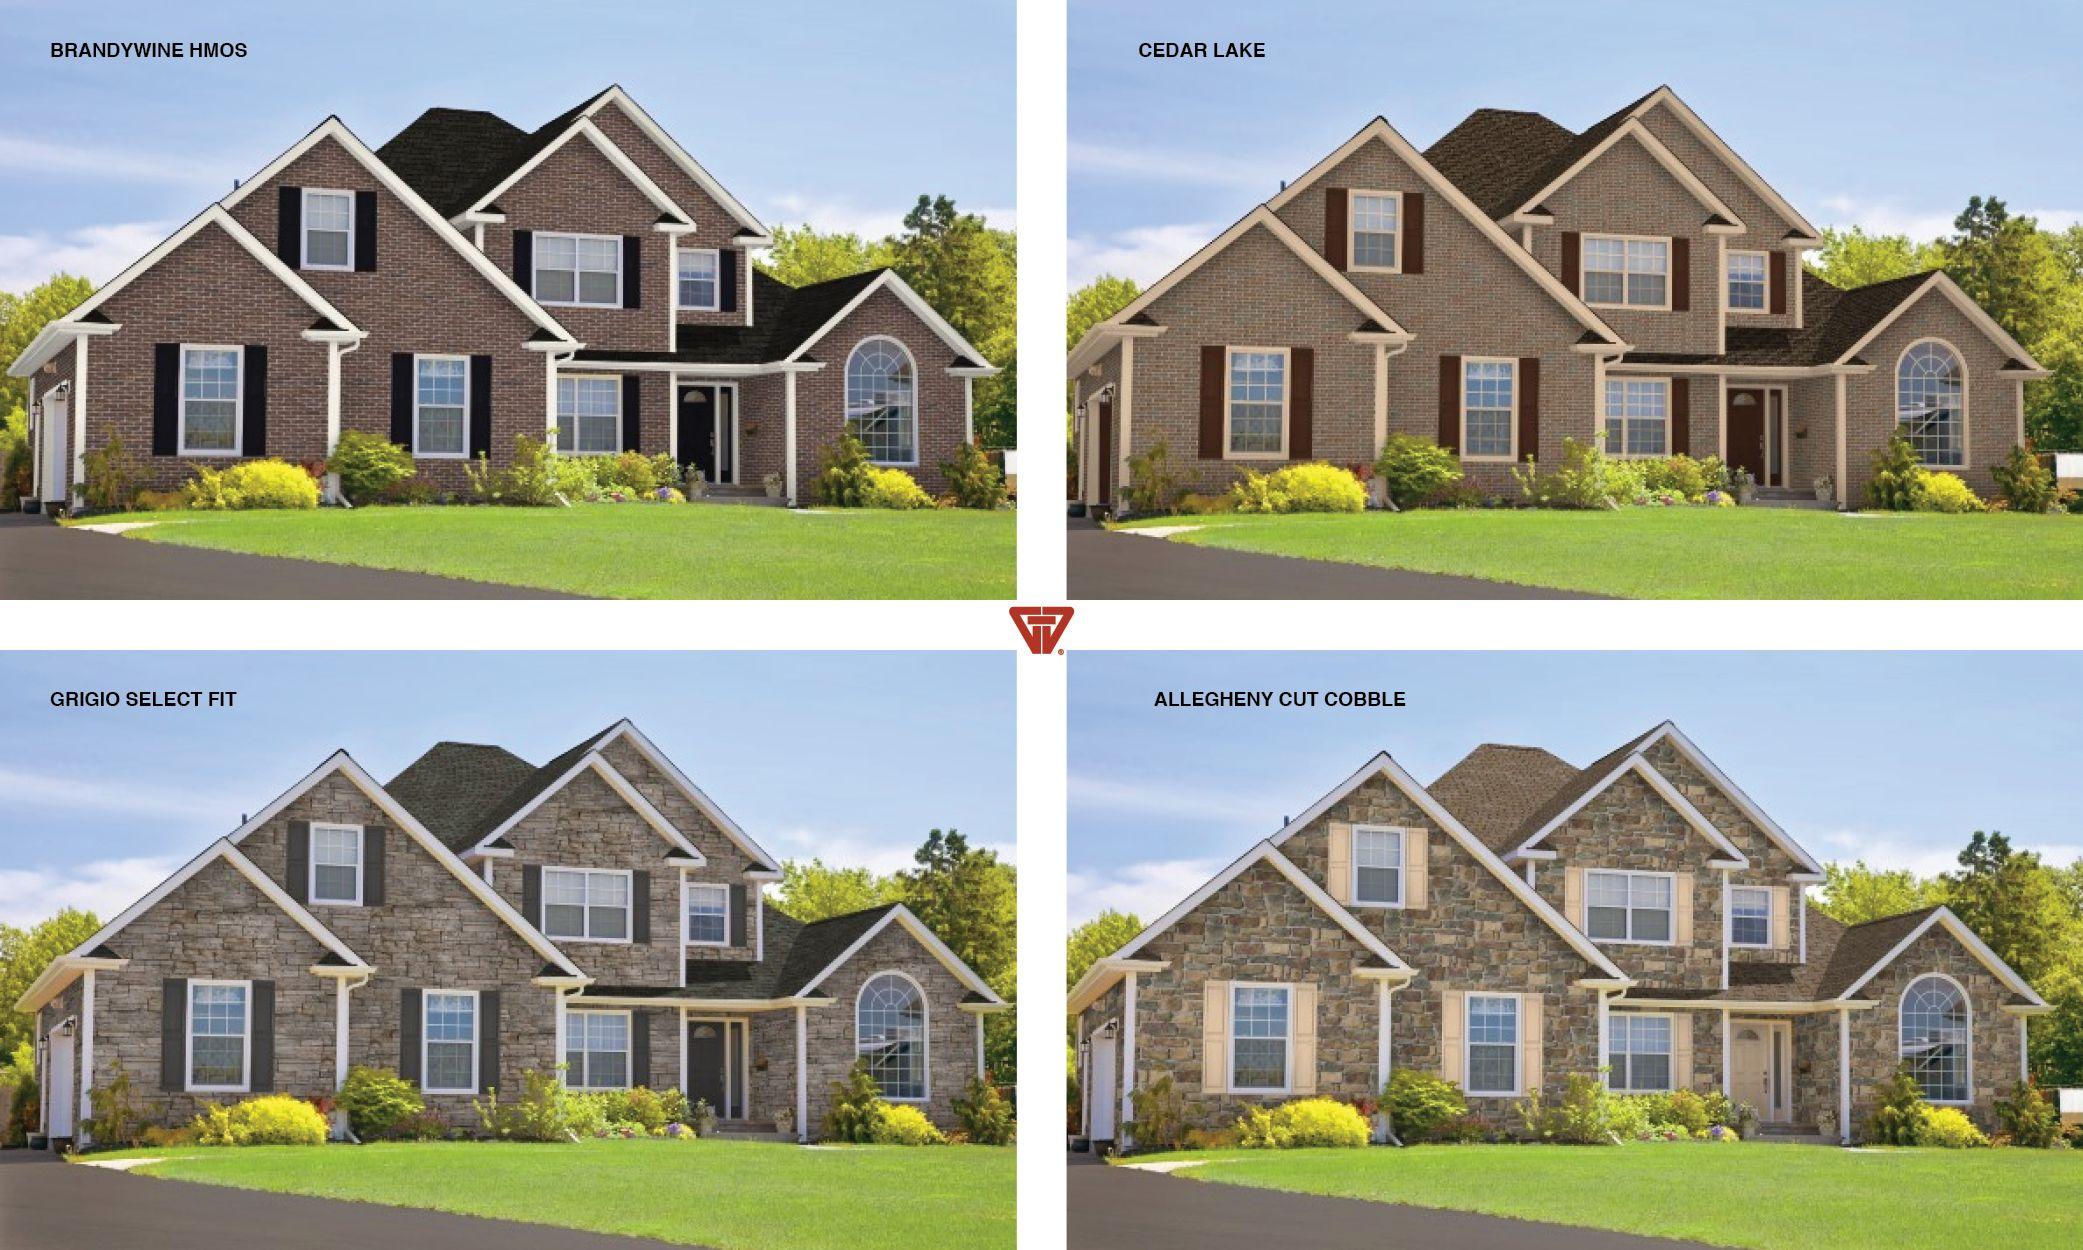 Home Design Prefer Glen-gery